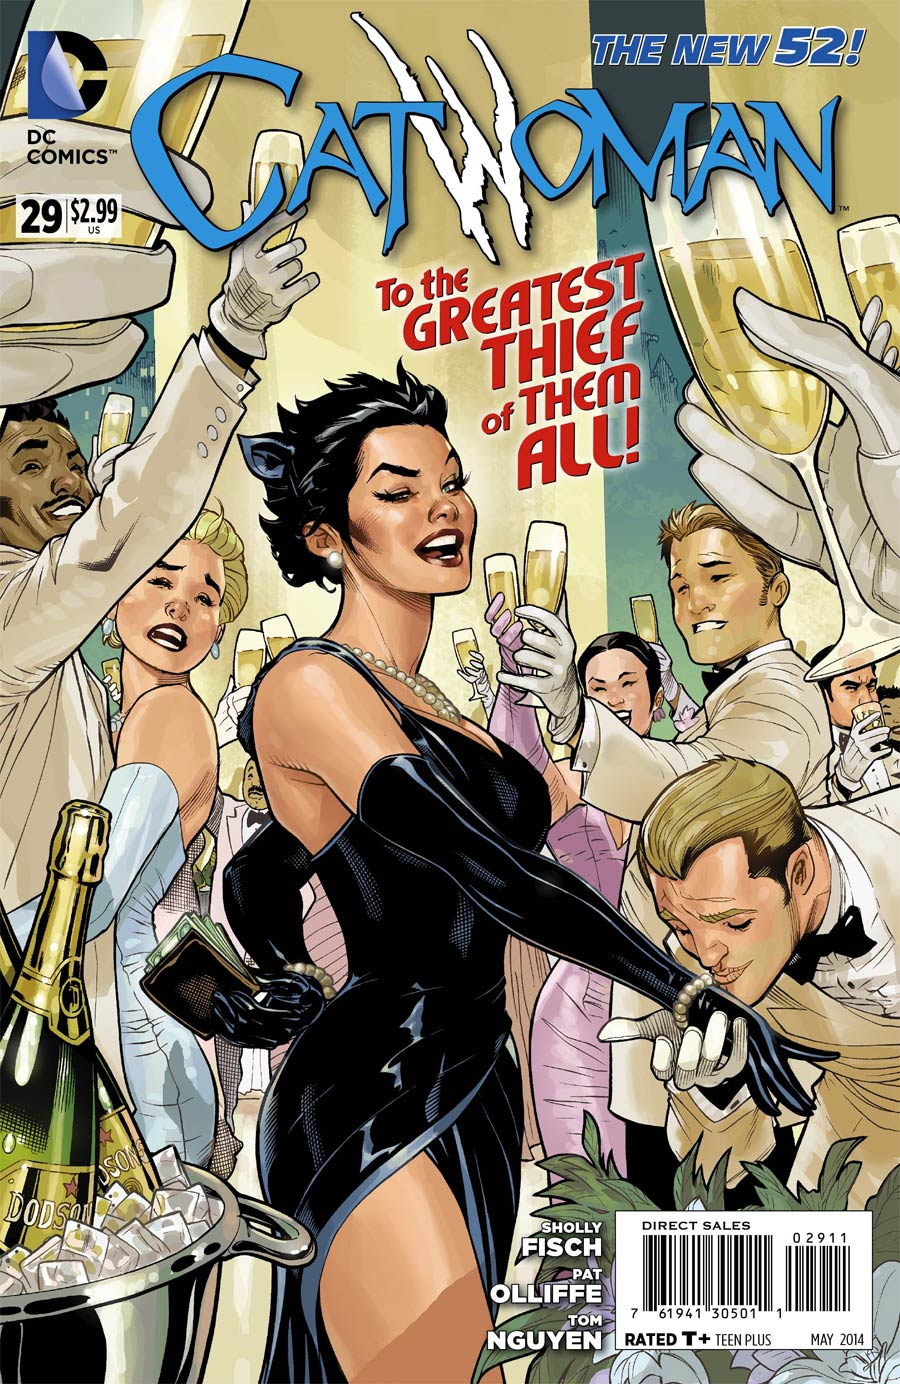 Catwoman Vol 4 #29